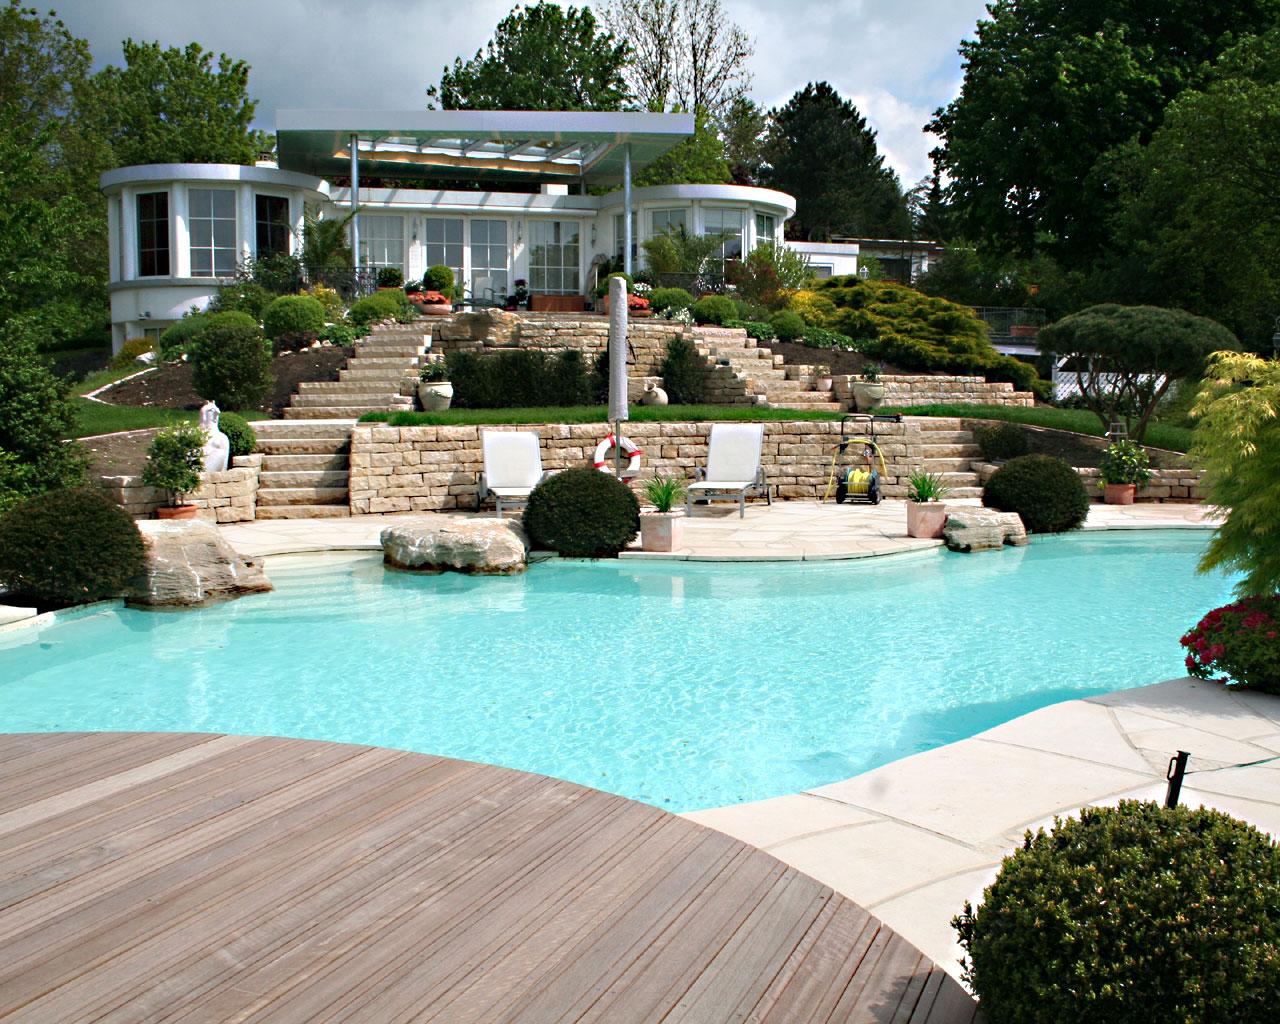 Wasser Im Garten : Planung wasser garten kirchner